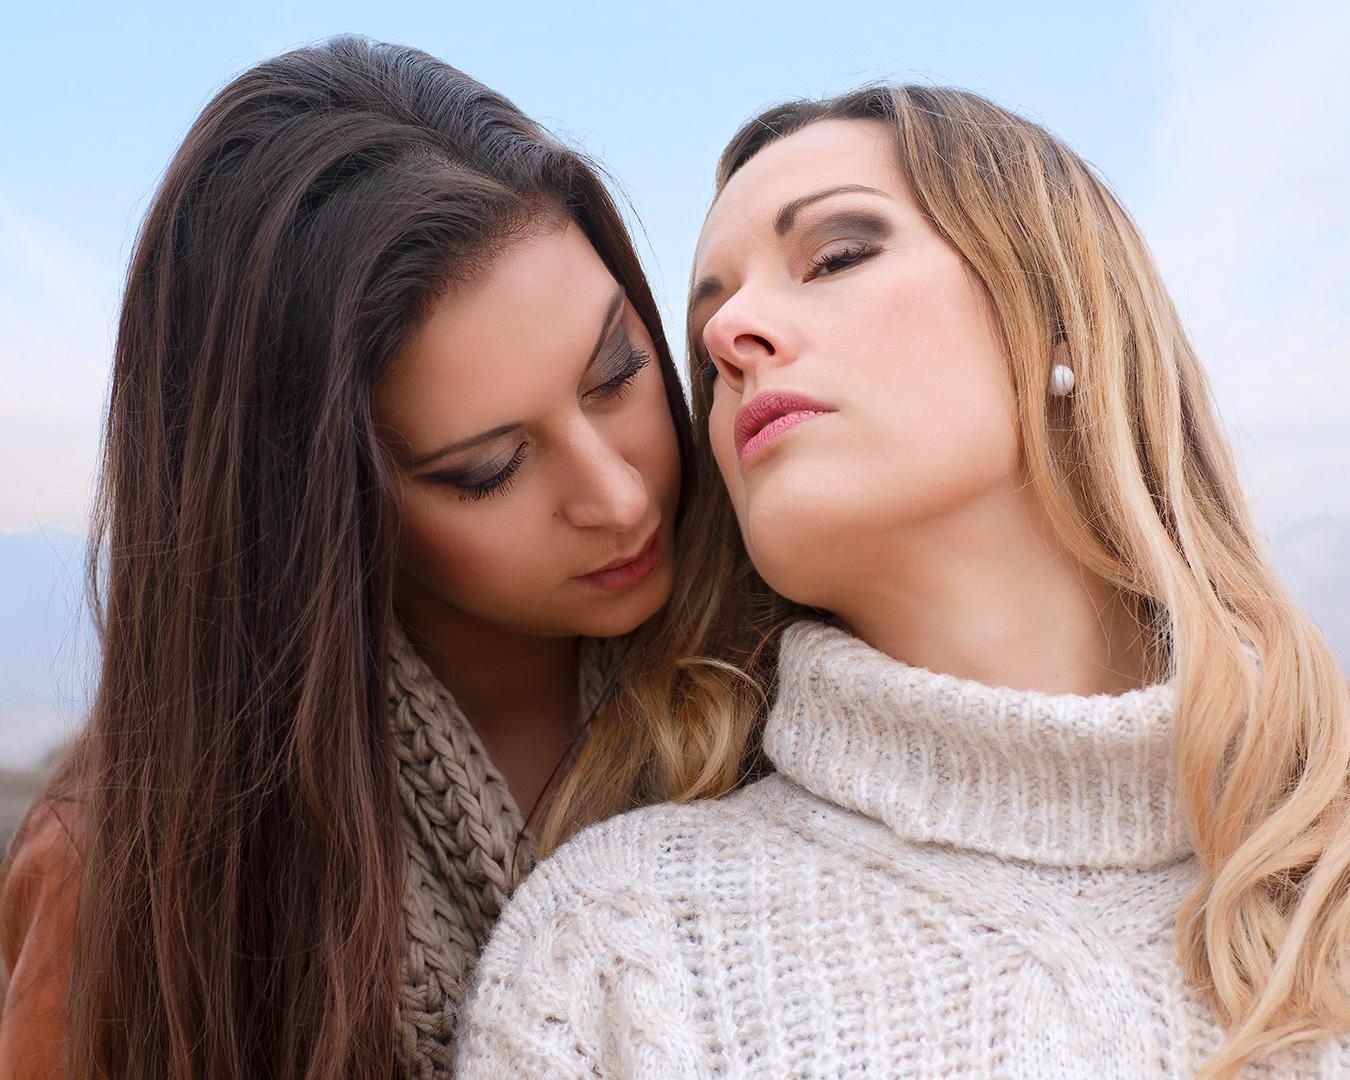 Cyndie & Élodie 2 filles sensuelles